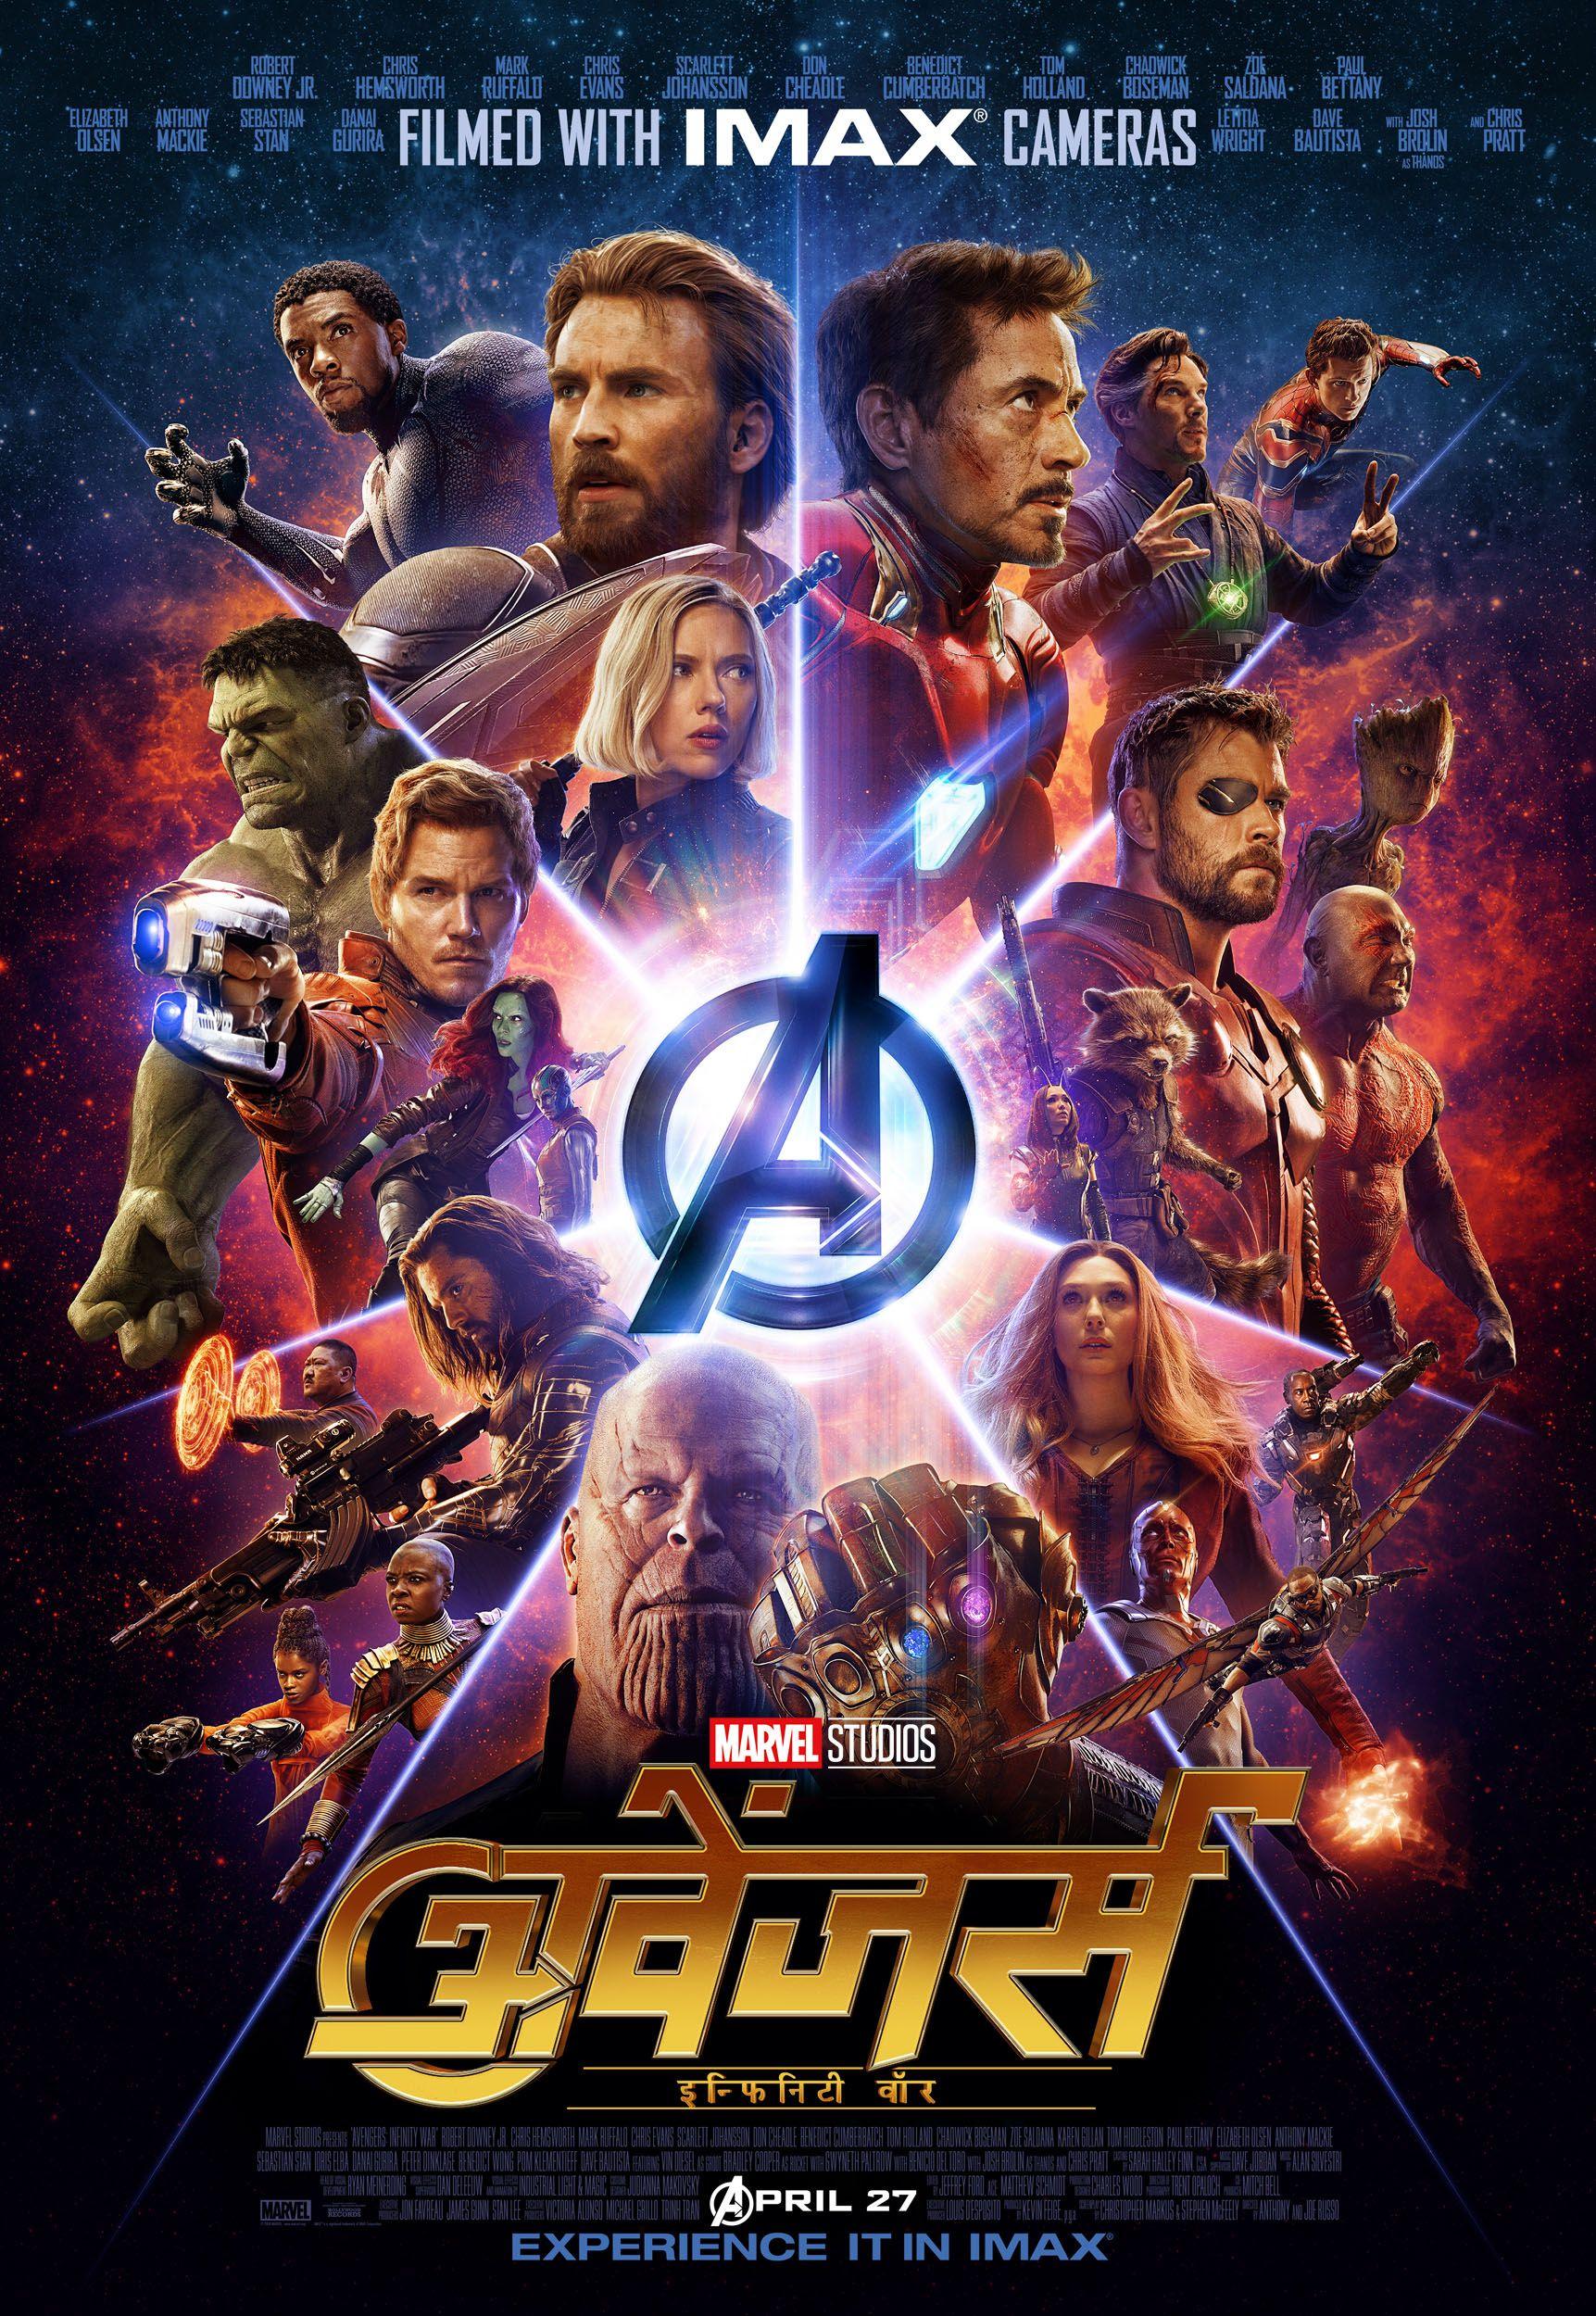 Avengers : Infinity War | Hindi Dubbing Wiki | FANDOM powered by Wikia